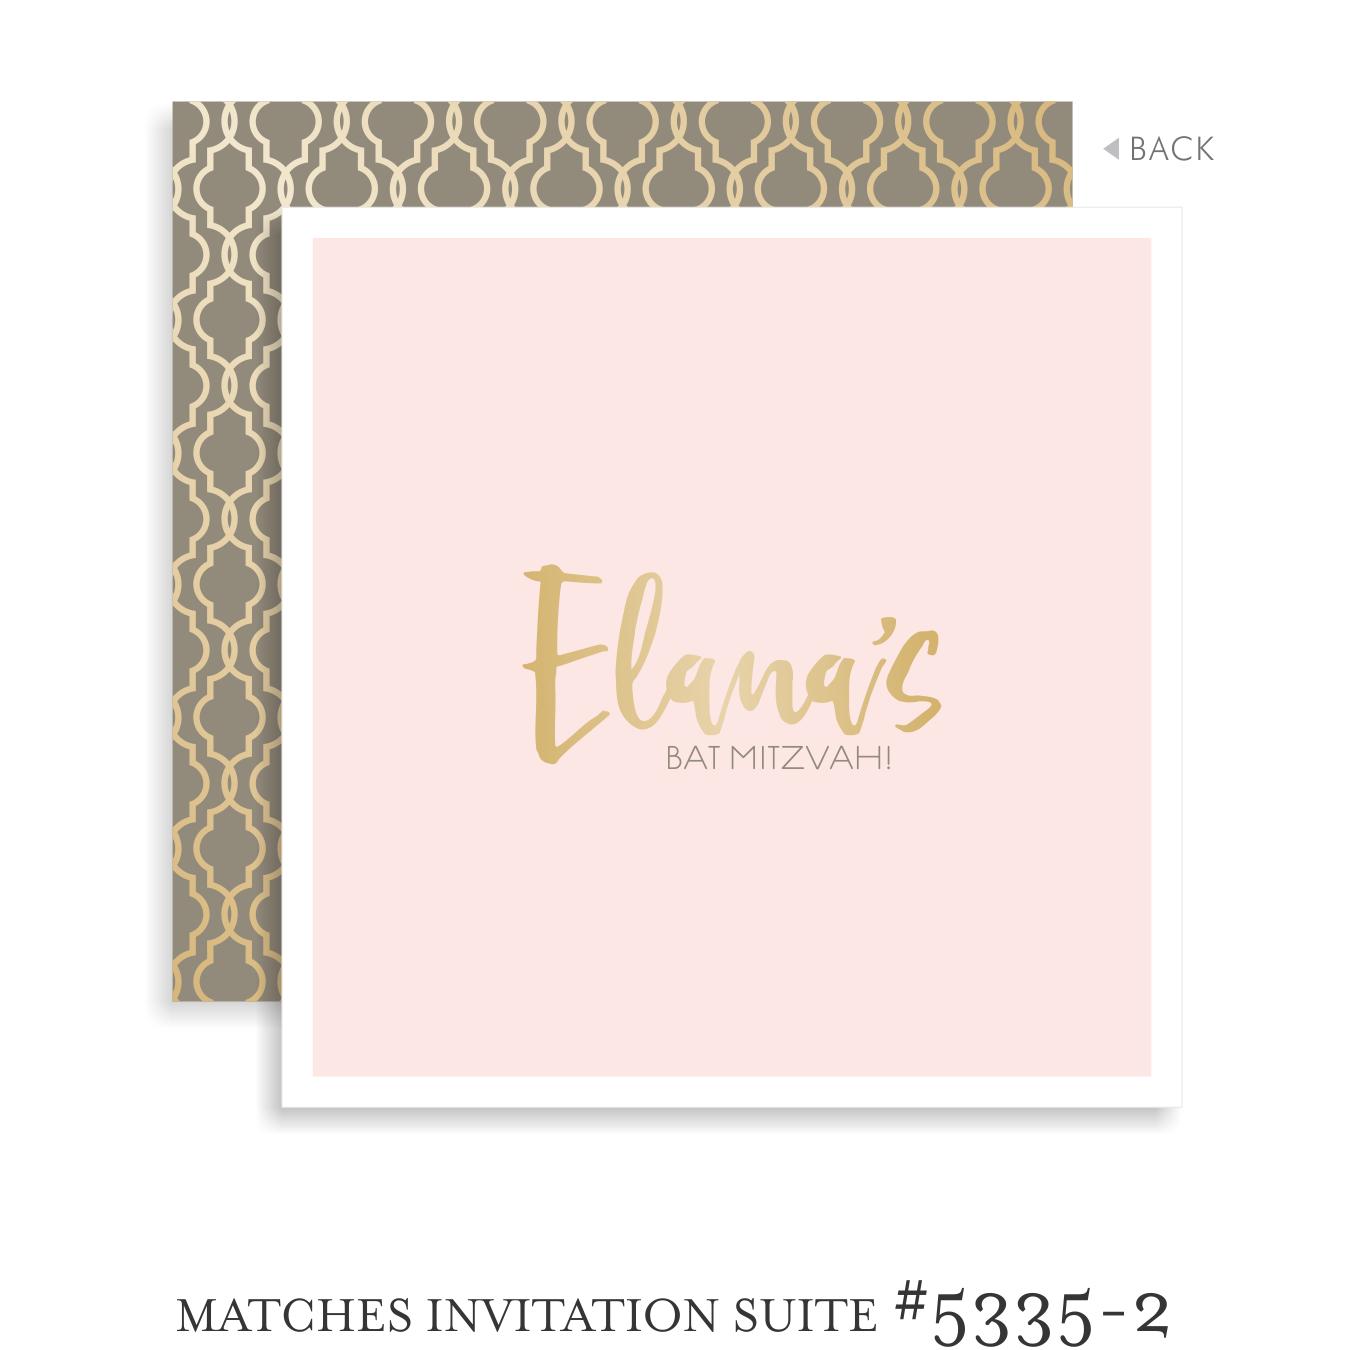 http://www.sarahschwartz.com/bat-mitzvah-invitations-5335-2